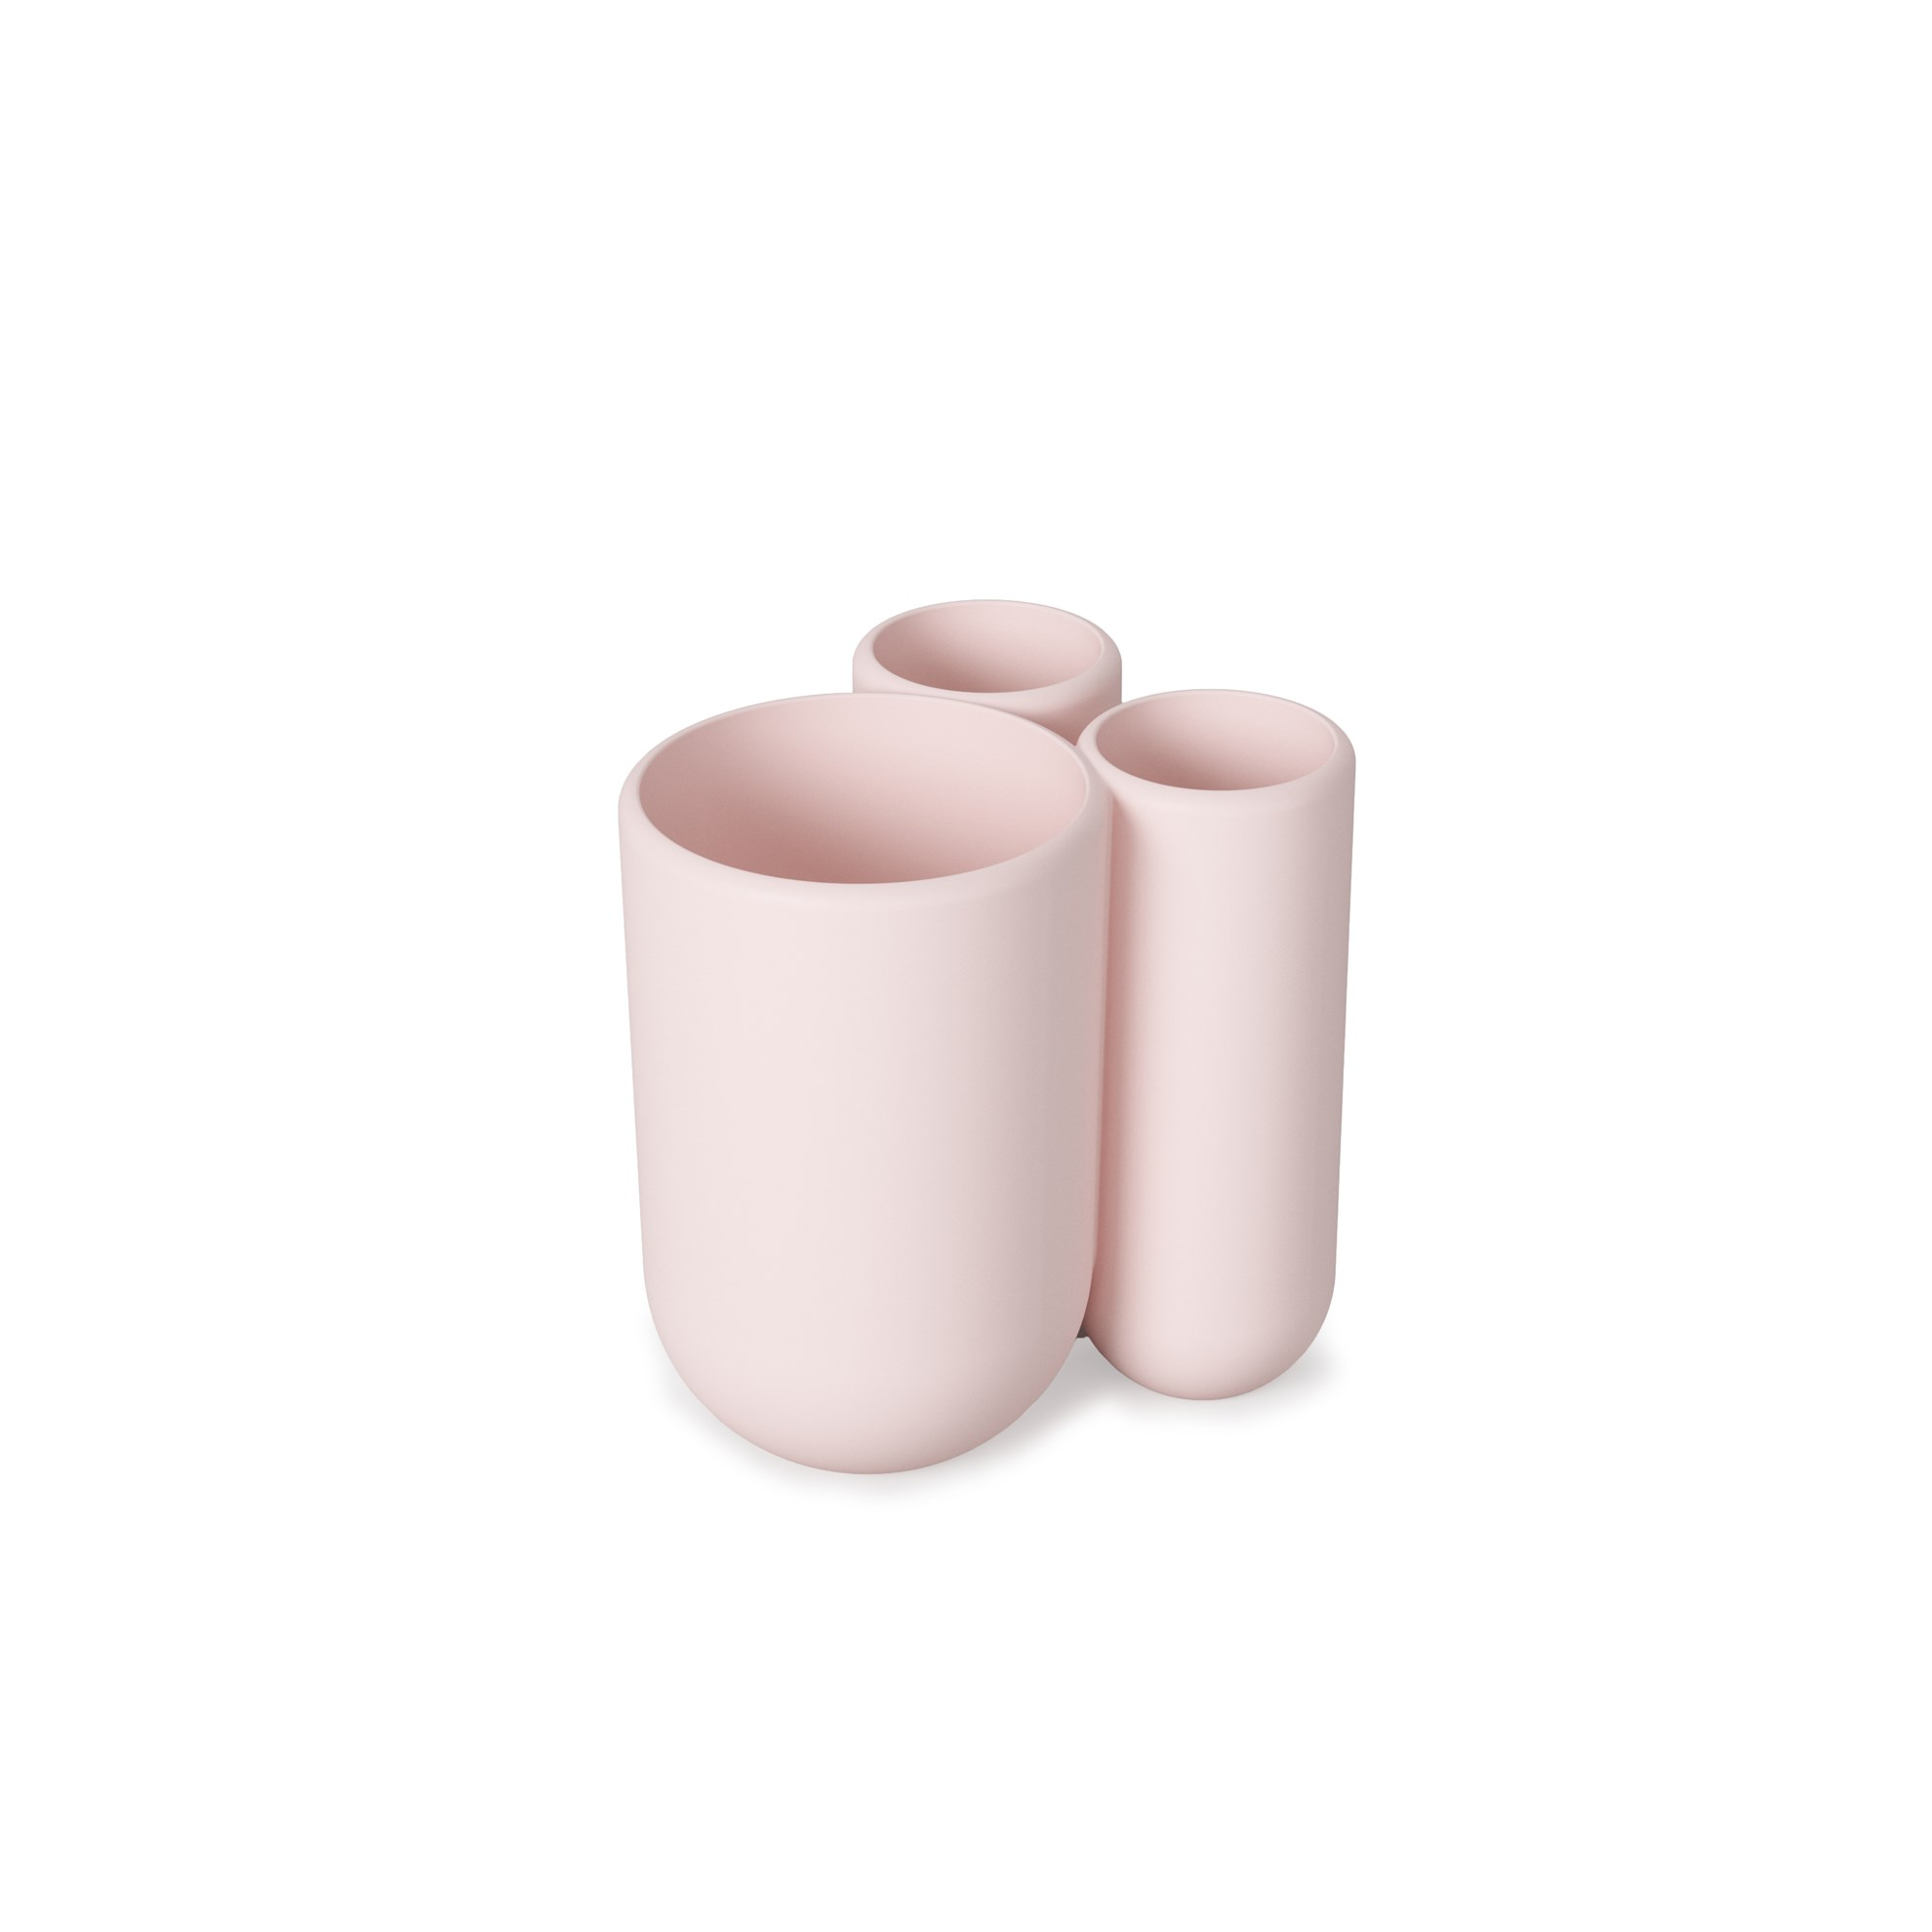 Kelímek na kartáček TOUCH růžový_0